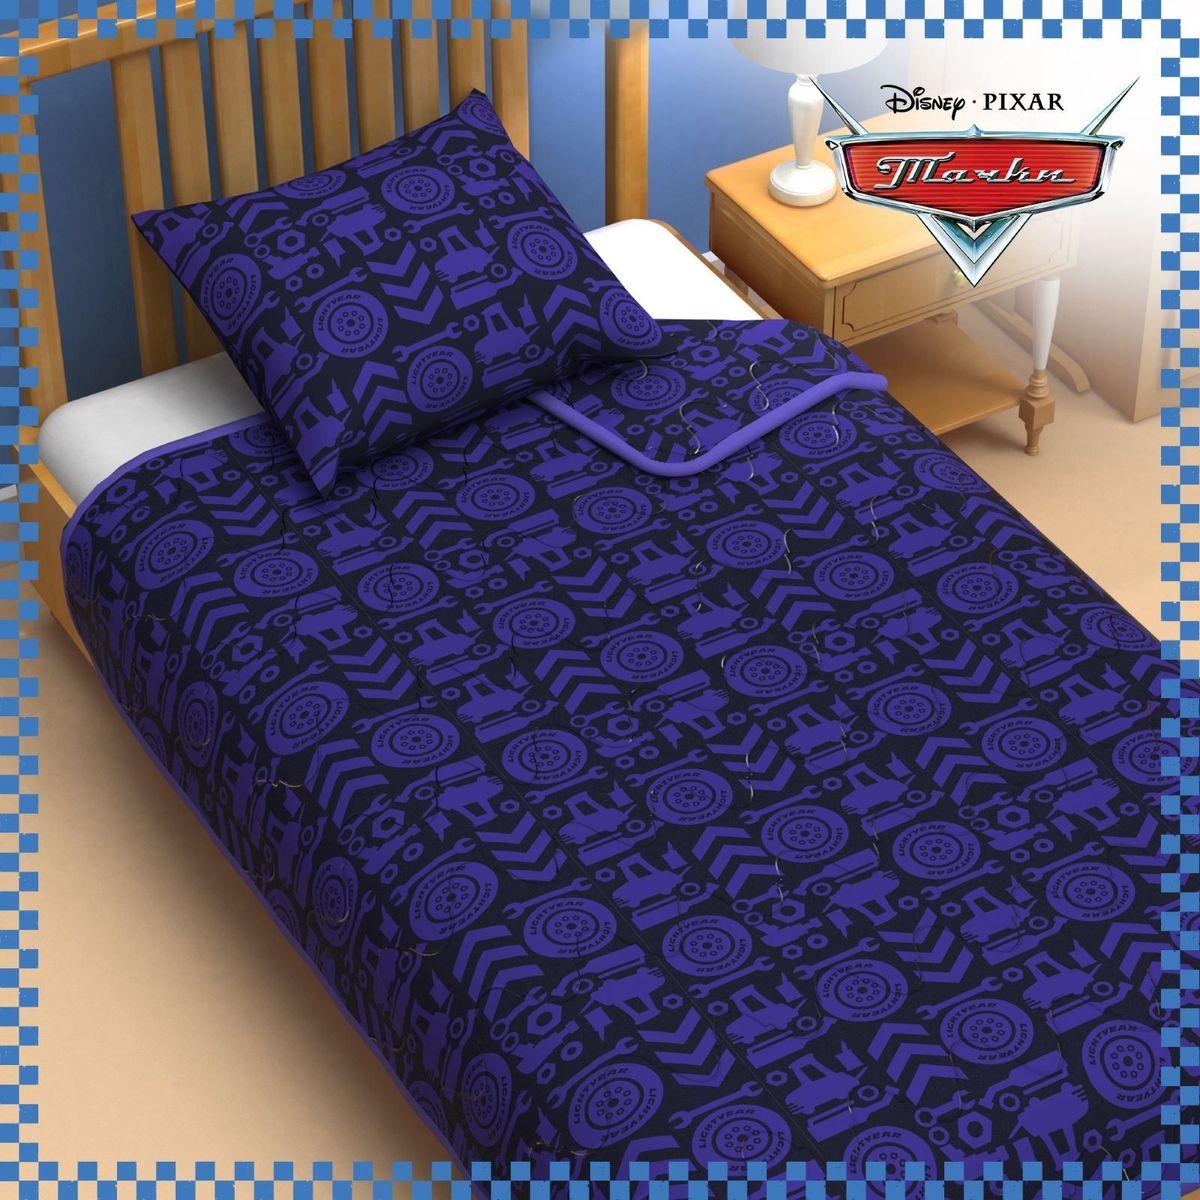 Disney Одеяло 1,5 спальное Тачки 140 х 205 см 1153171 - Детский текстиль